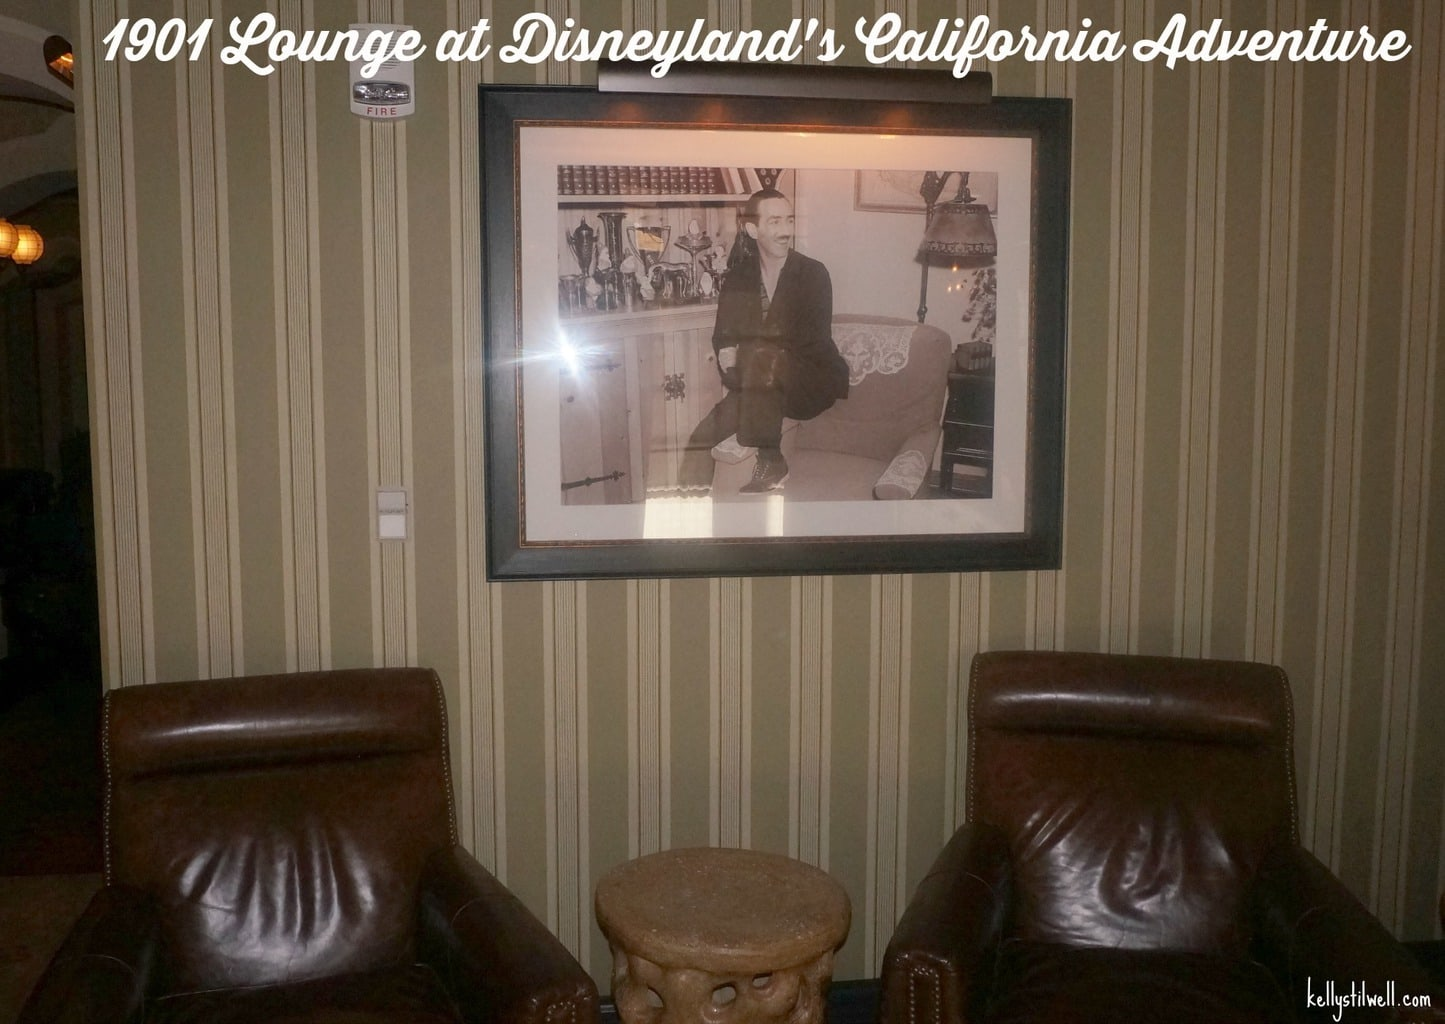 Disney's 1901 Lounge 3